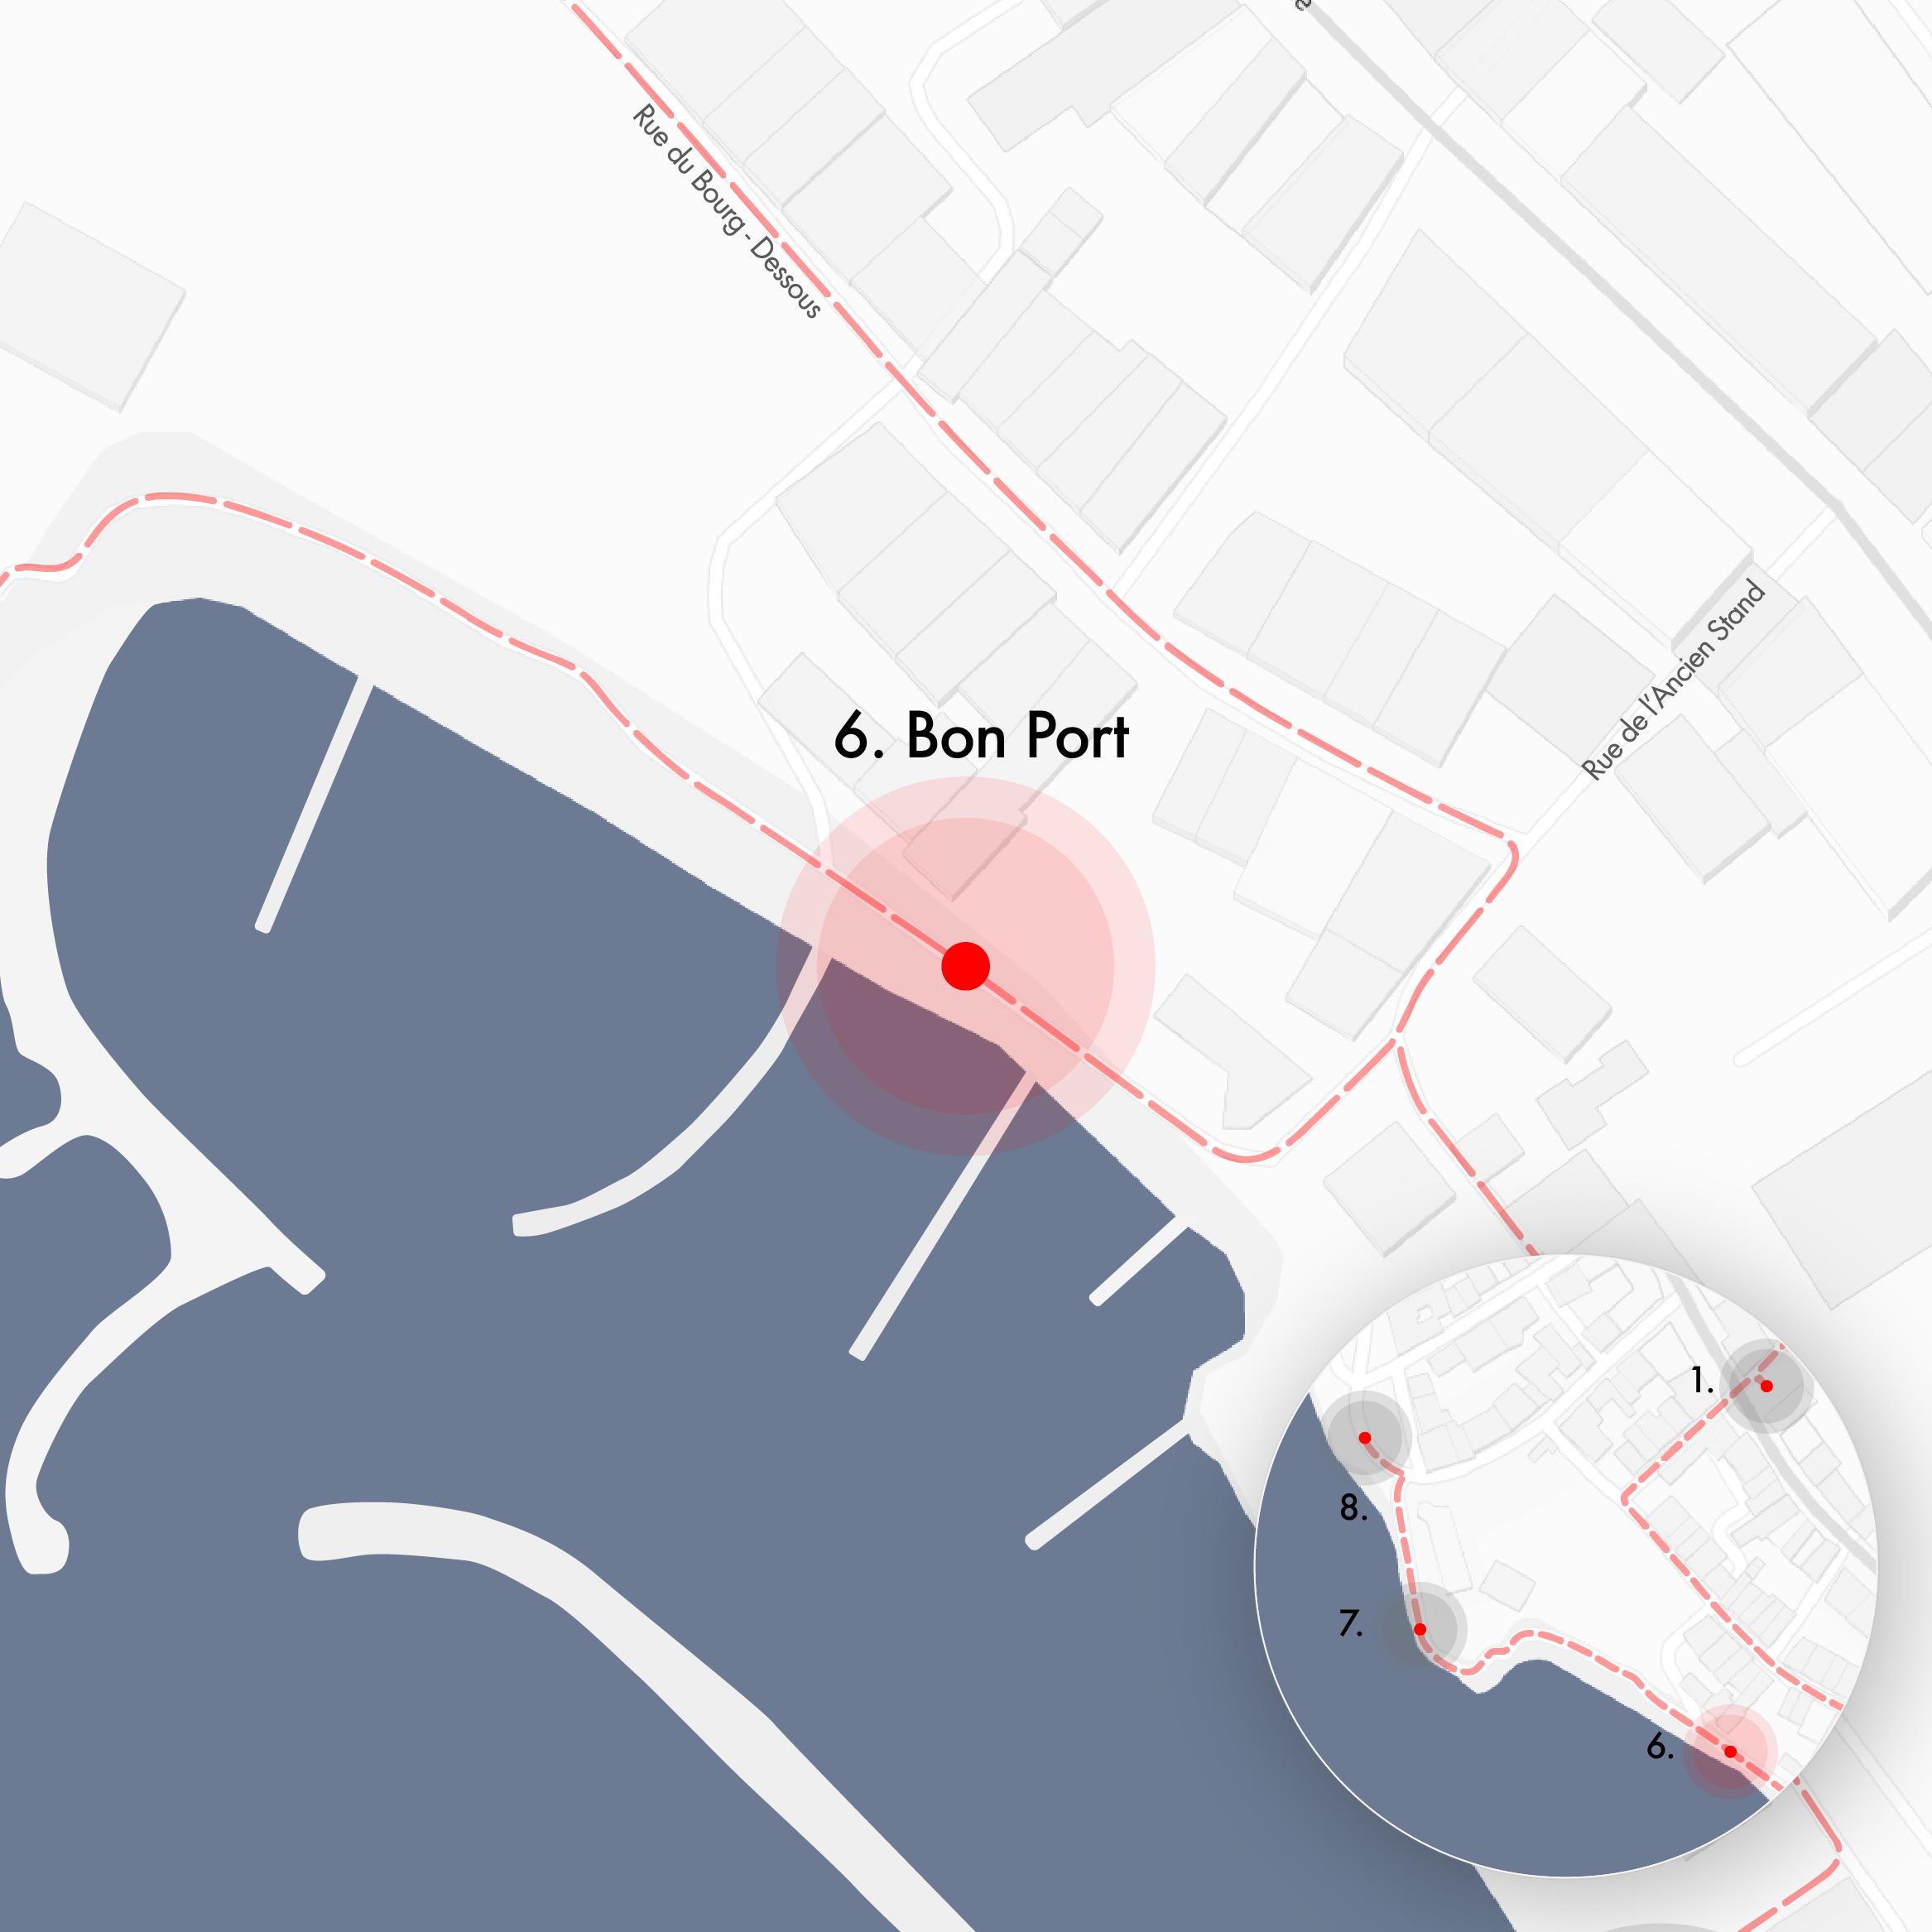 6. Bon Port